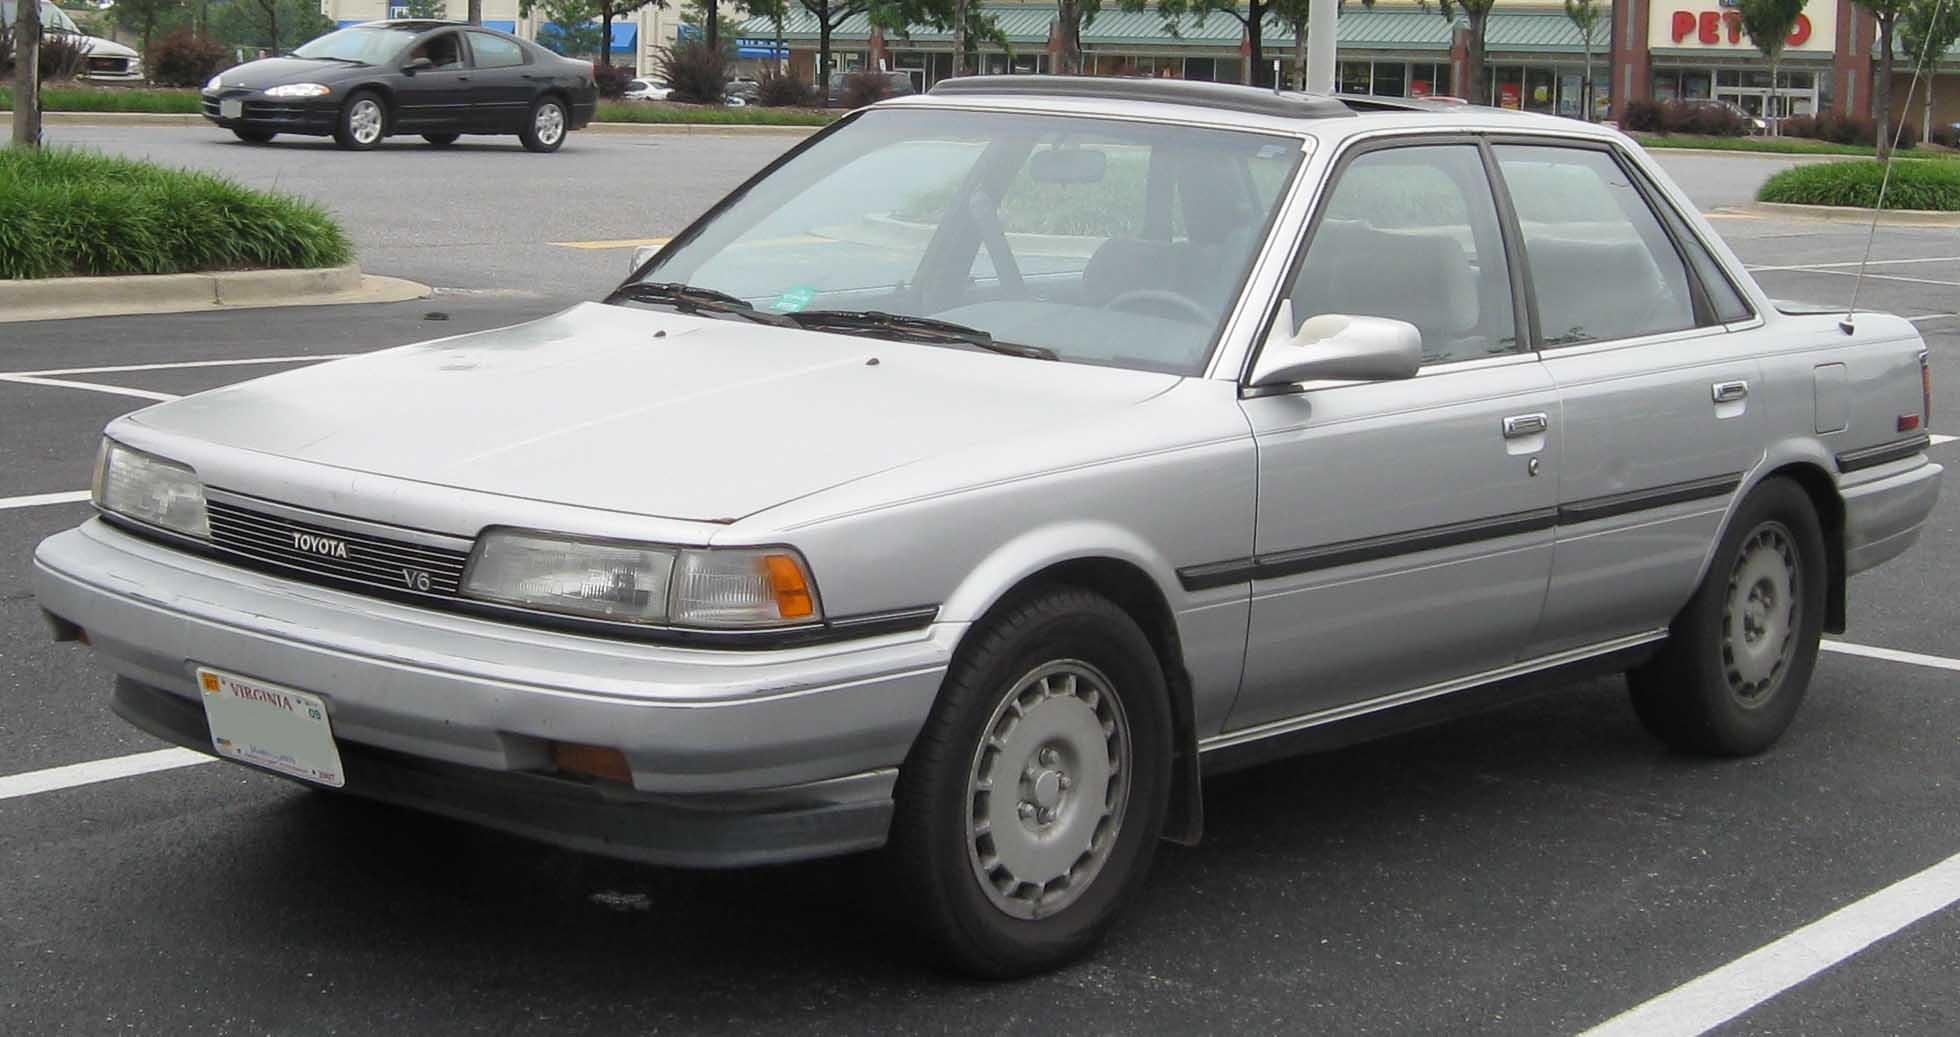 Toyota Vista II (V20) 1986 - 1990 Sedan #2